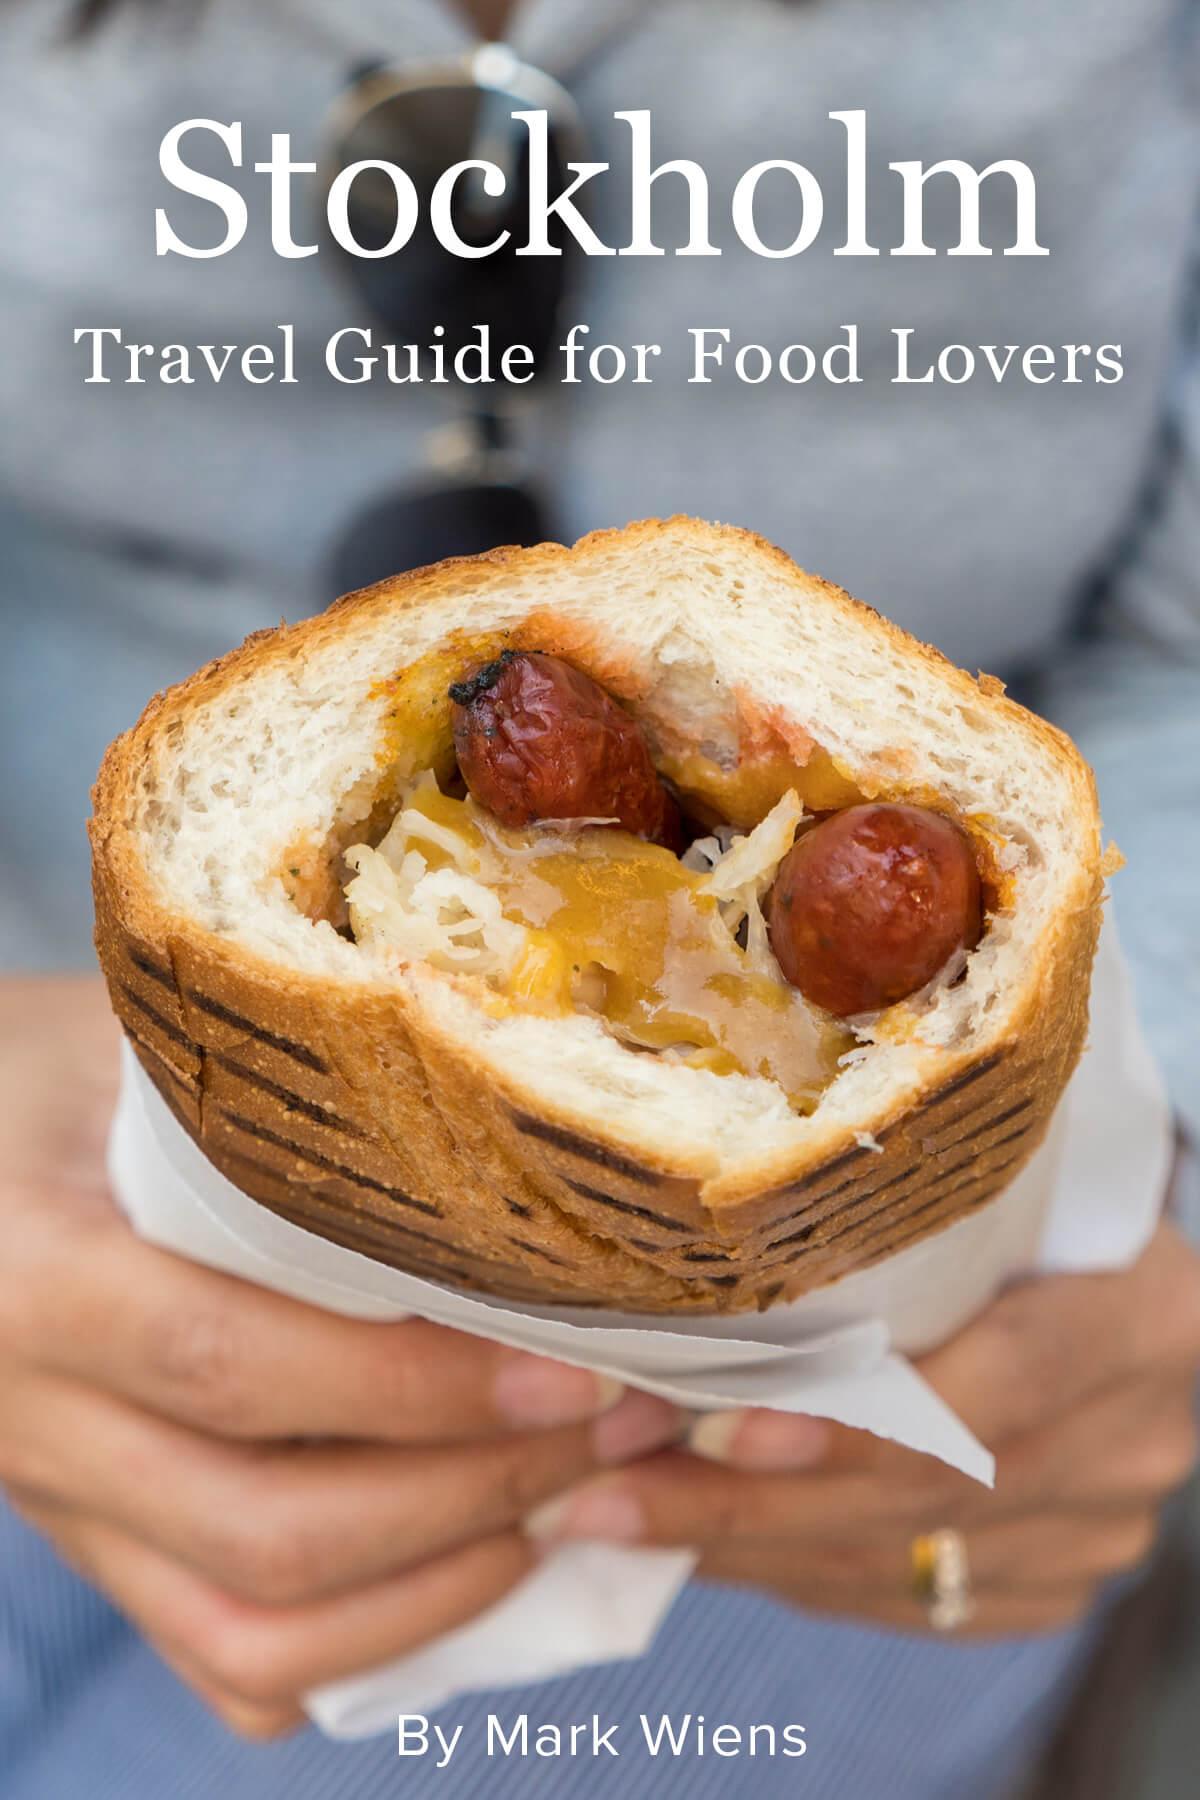 The Ultimate Stockholm Travel Guide for Food Lovers | Migrationology migrationology.com